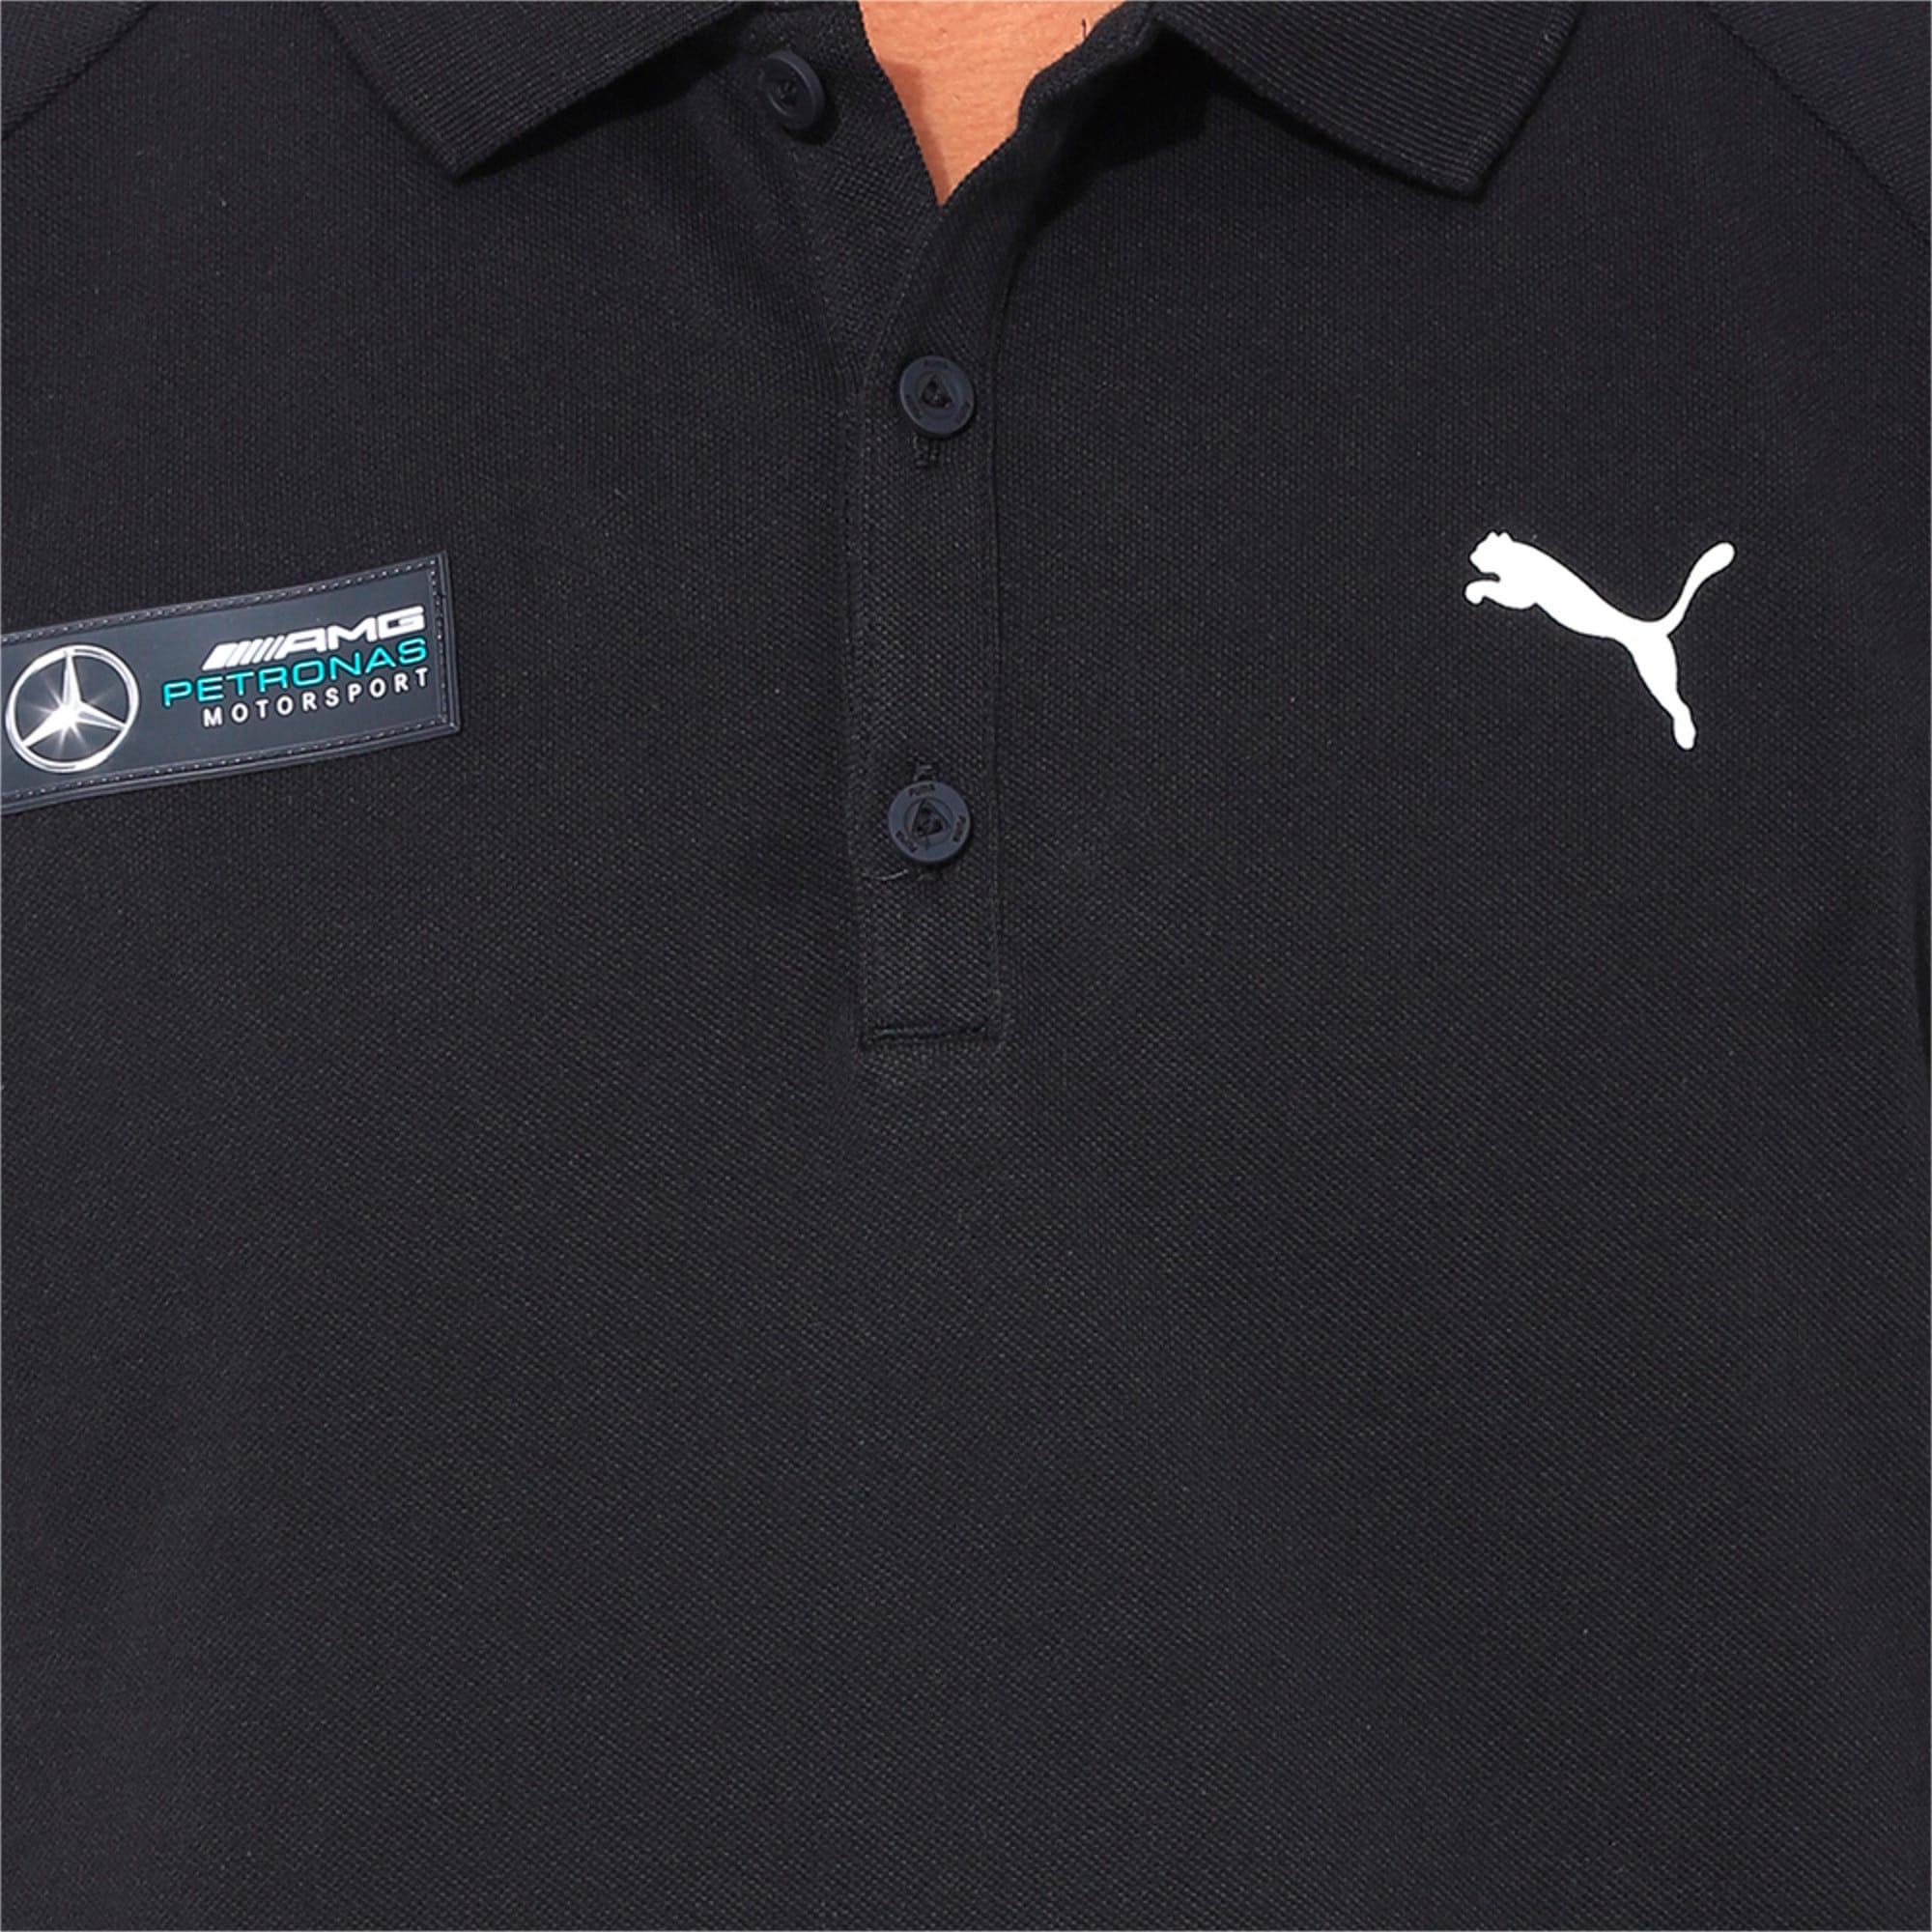 Thumbnail 6 of MERCEDES AMG PETRONAS Men's Polo, Puma Black, medium-IND